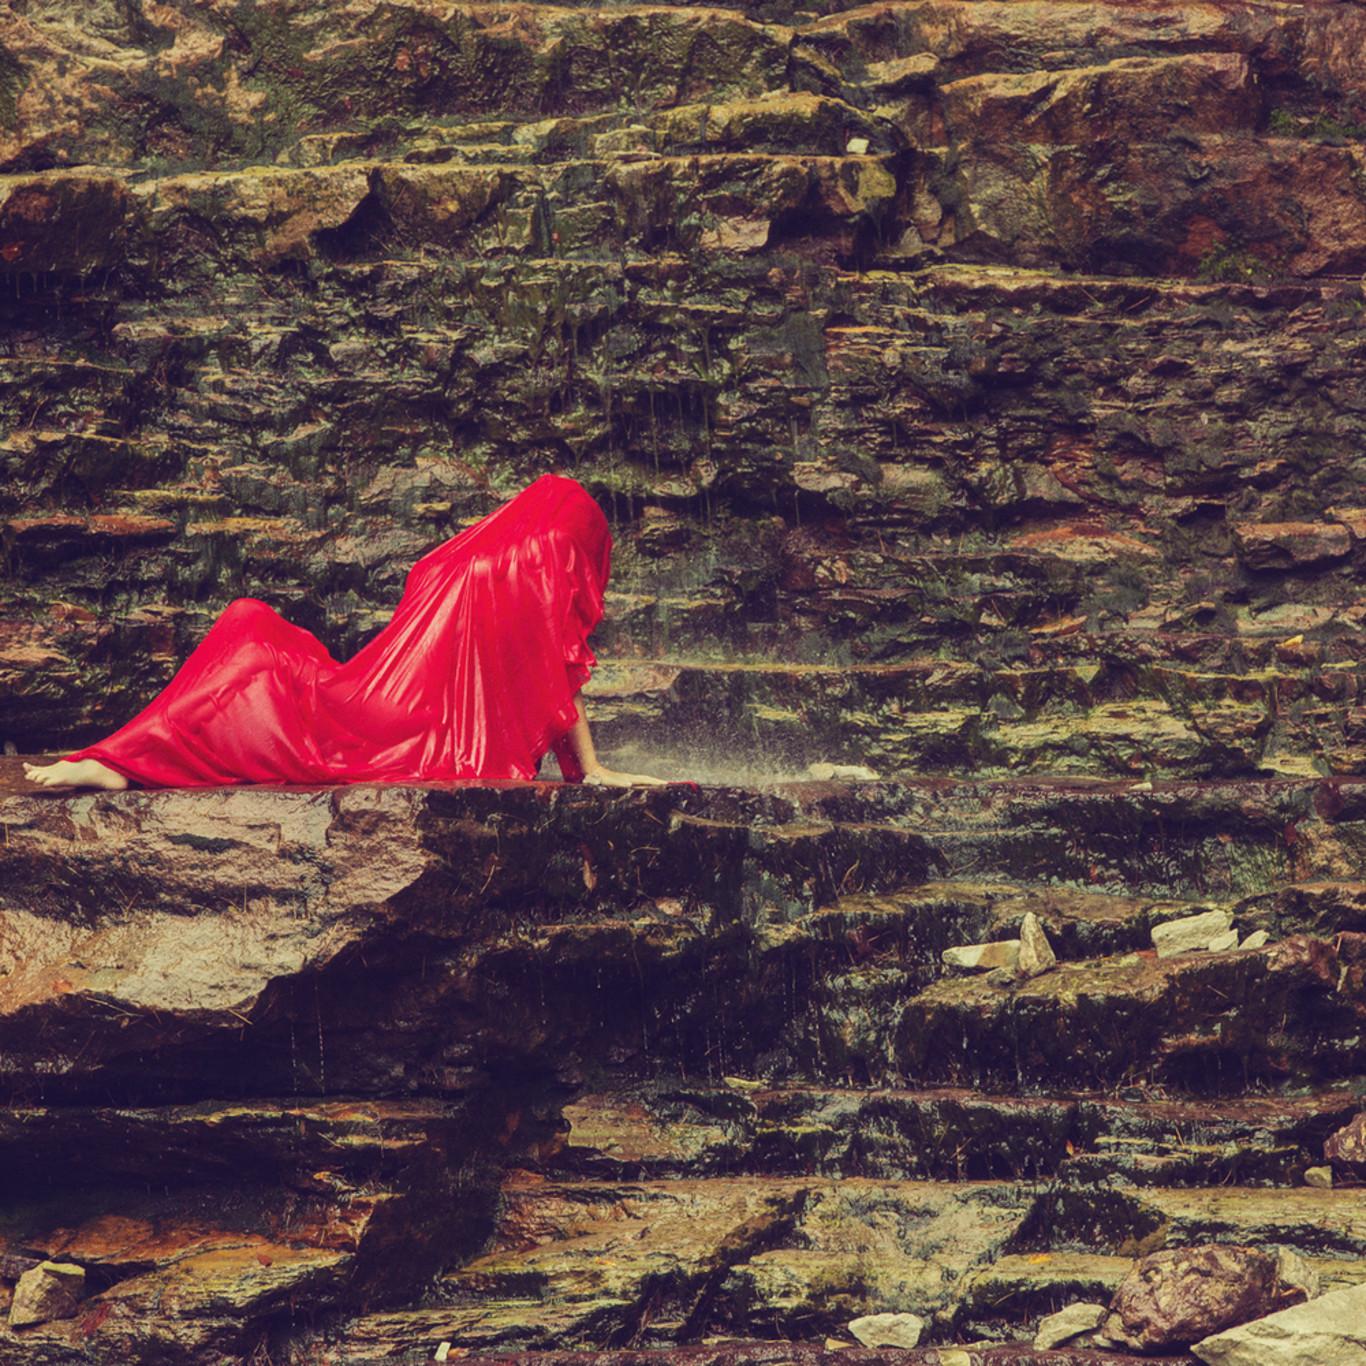 13 clayton woodley lobelia cardinalis shot in catskills ybaykg